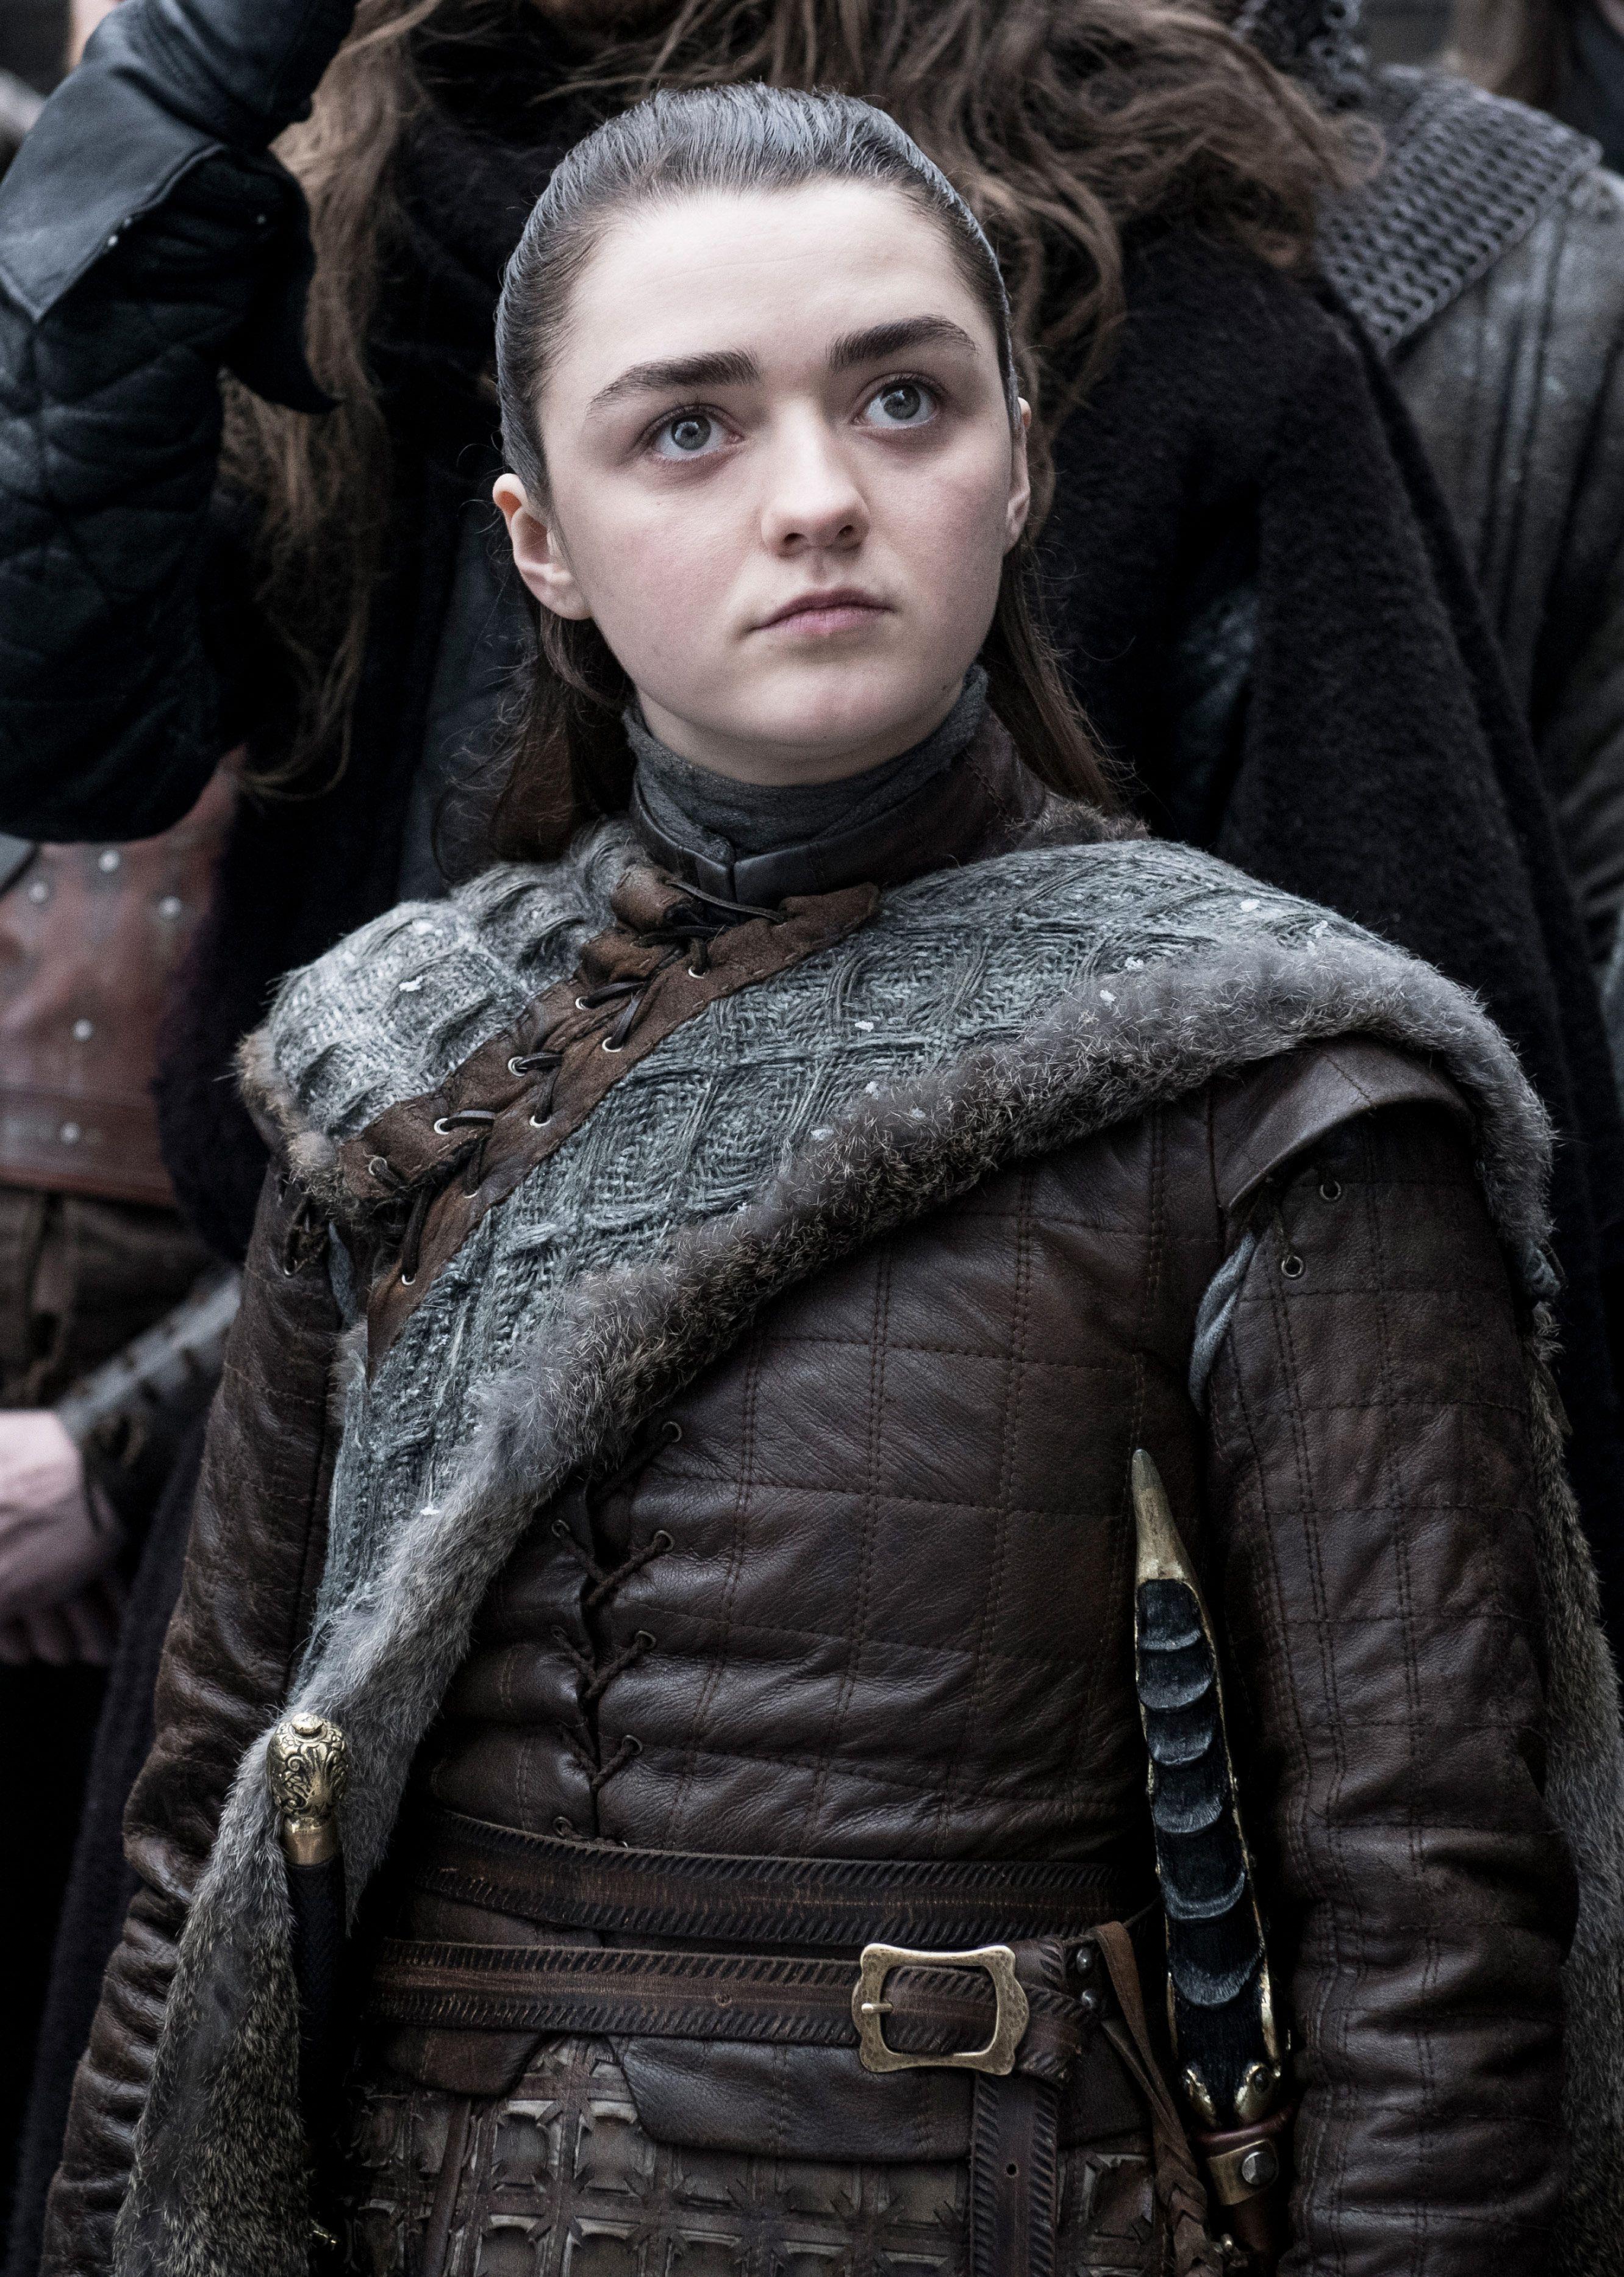 Comprar camisetas de Not Today de Arya Stark